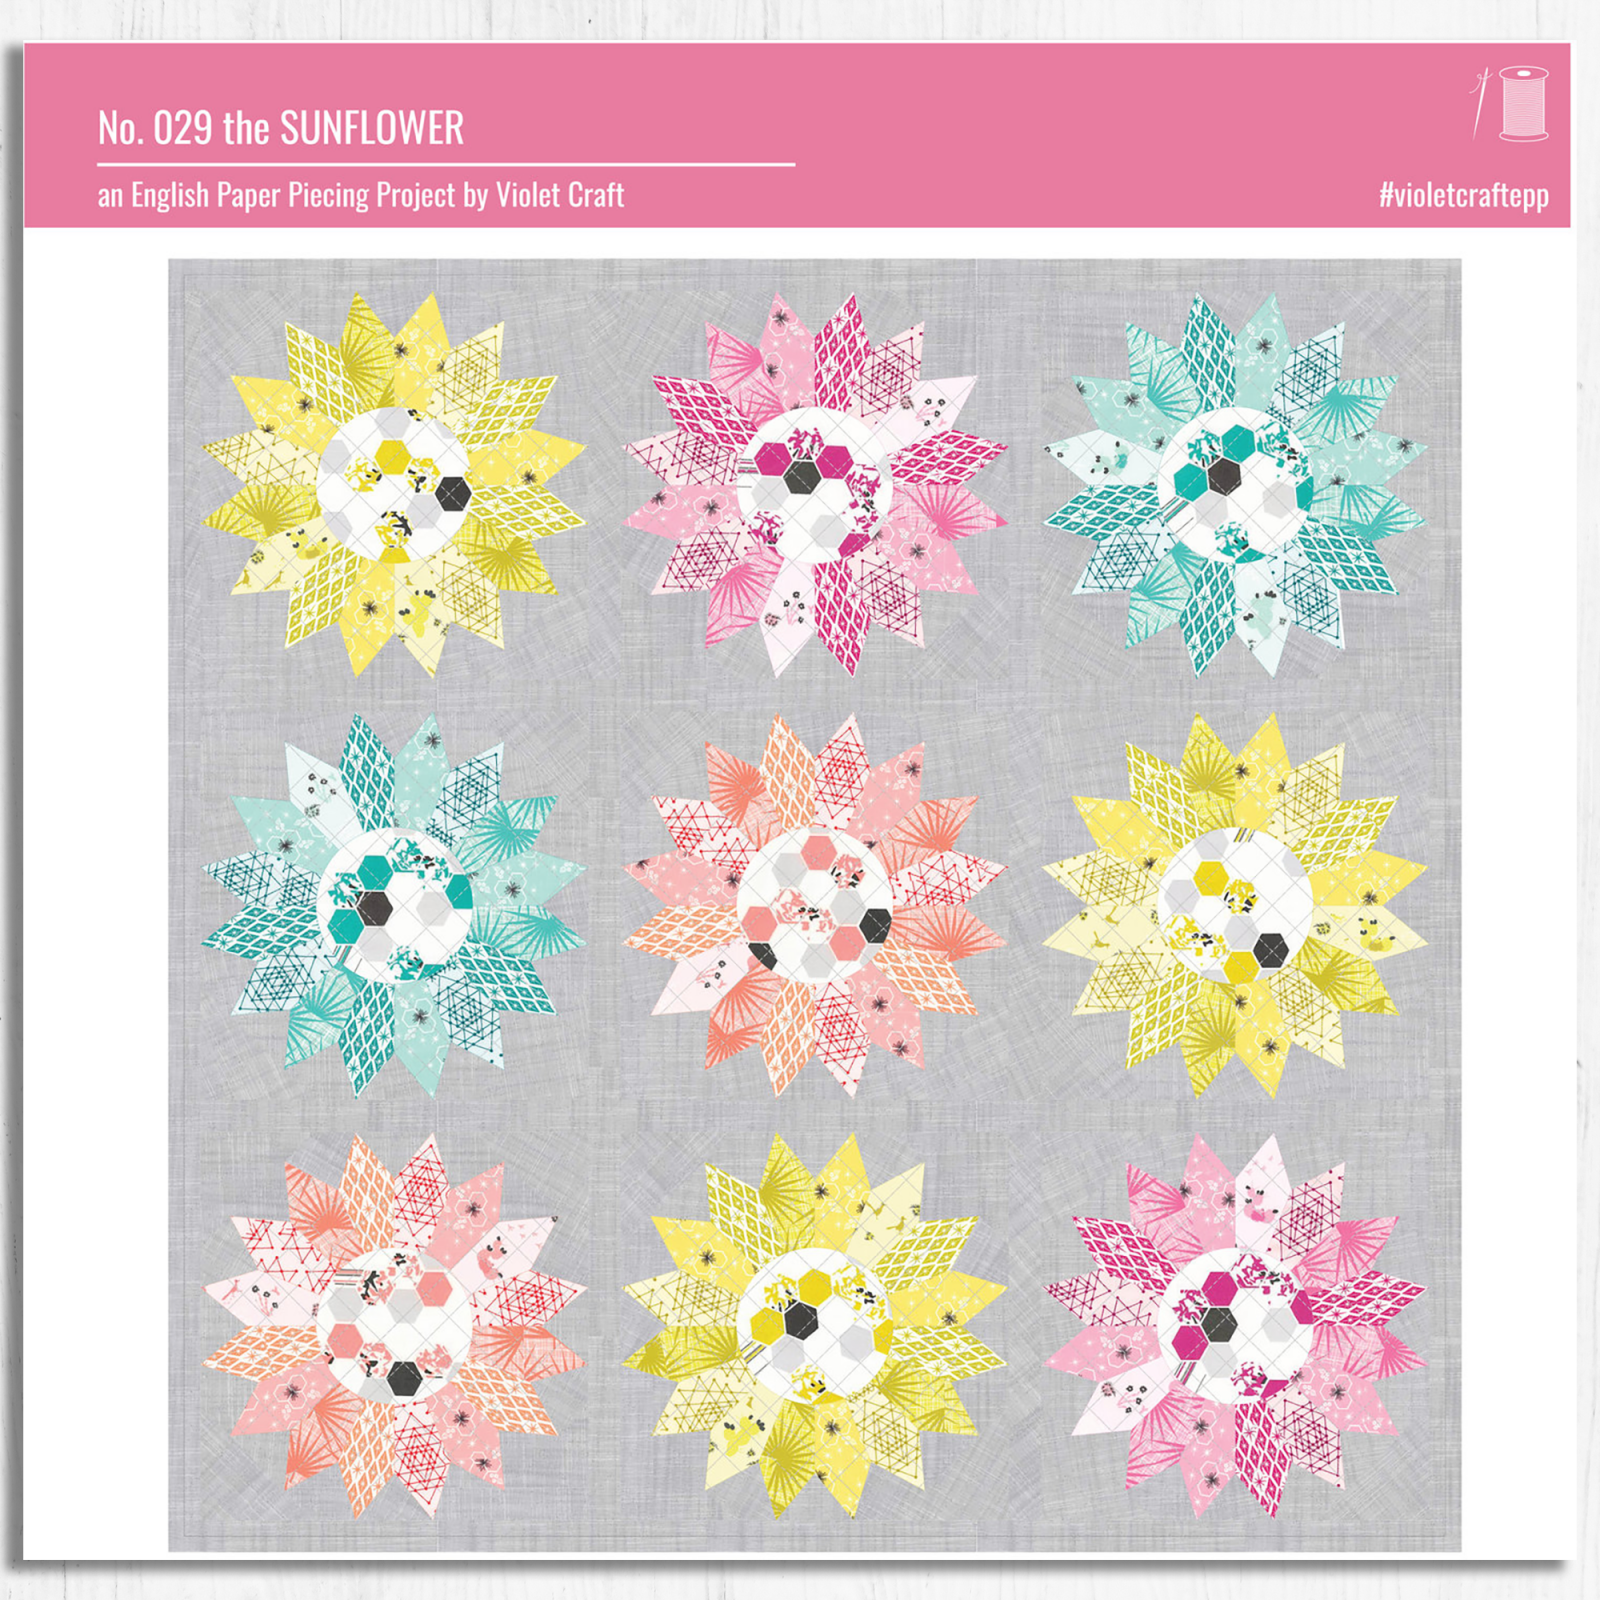 Violet Craft - The Sunflower Epp